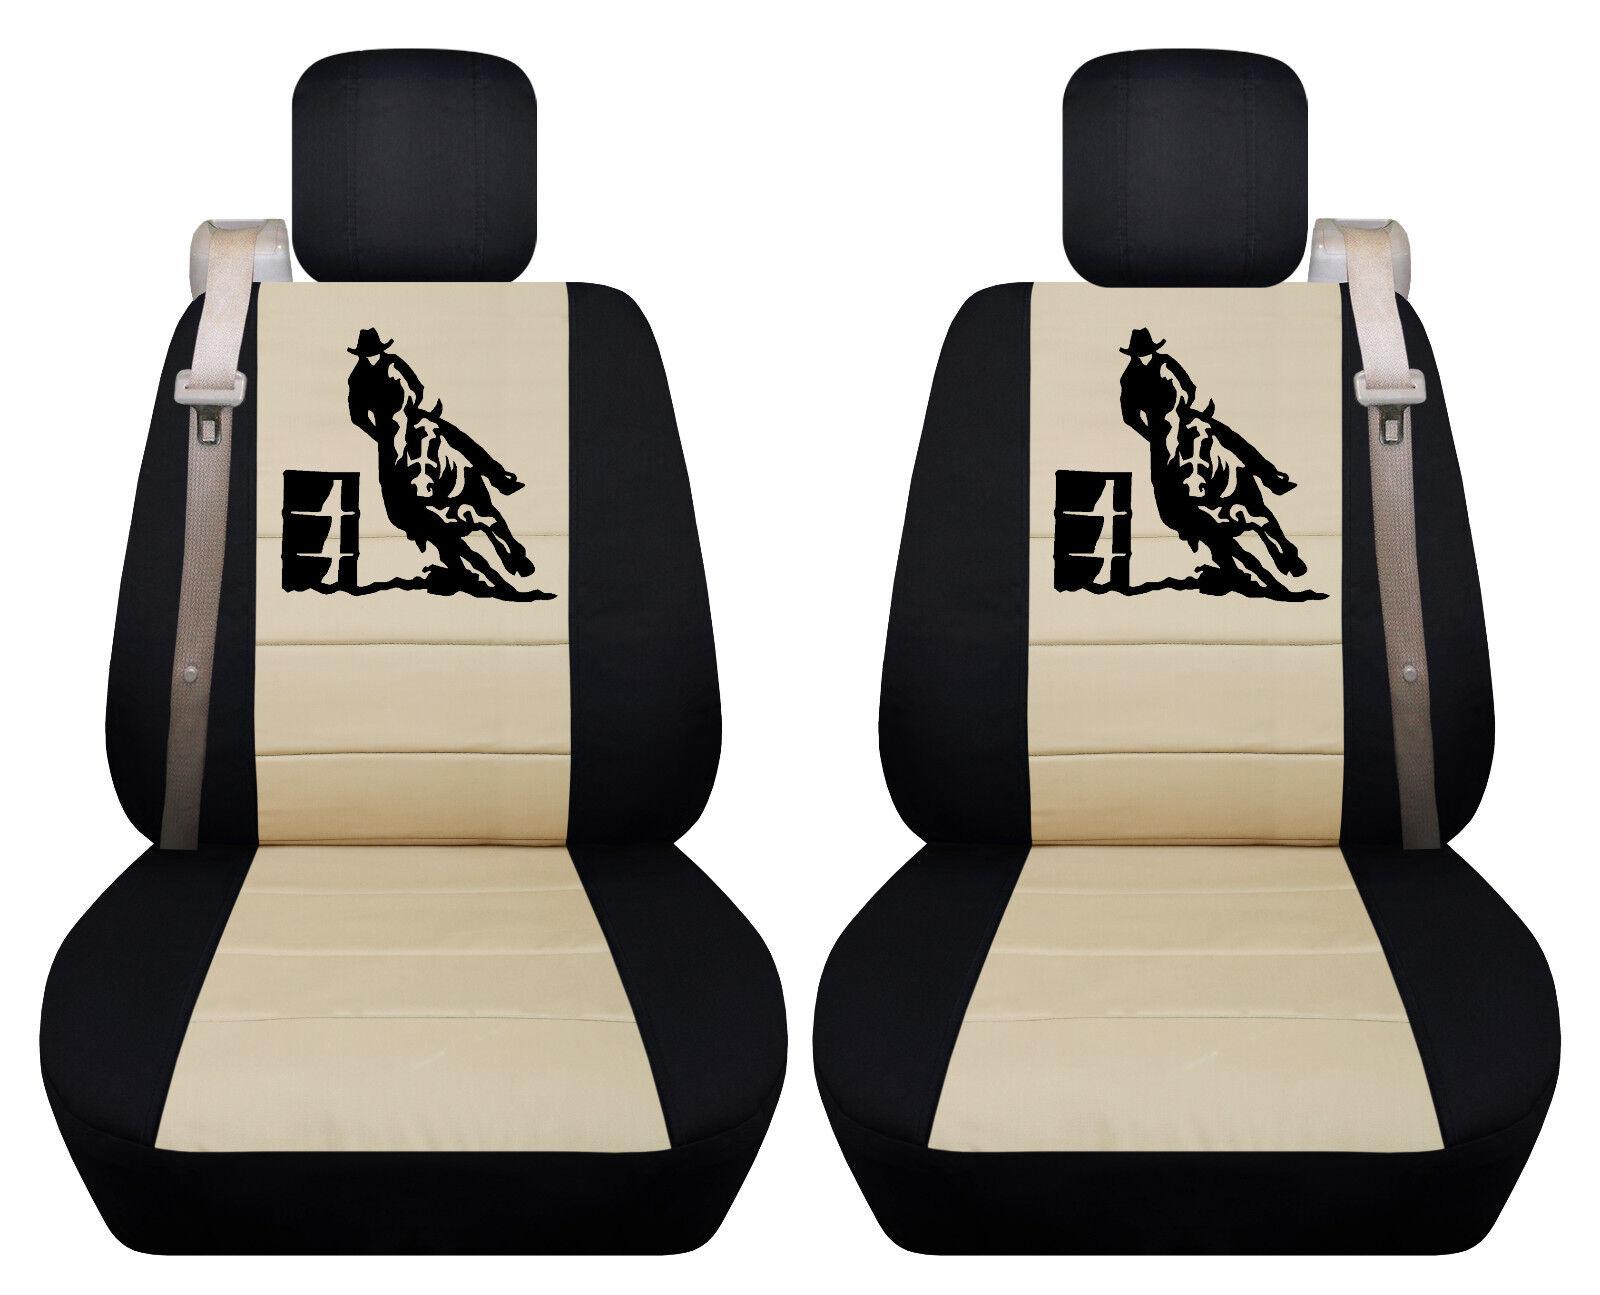 Fits Chevy trailblazer front car seat cover black-tan w//barrel racing//fleur...